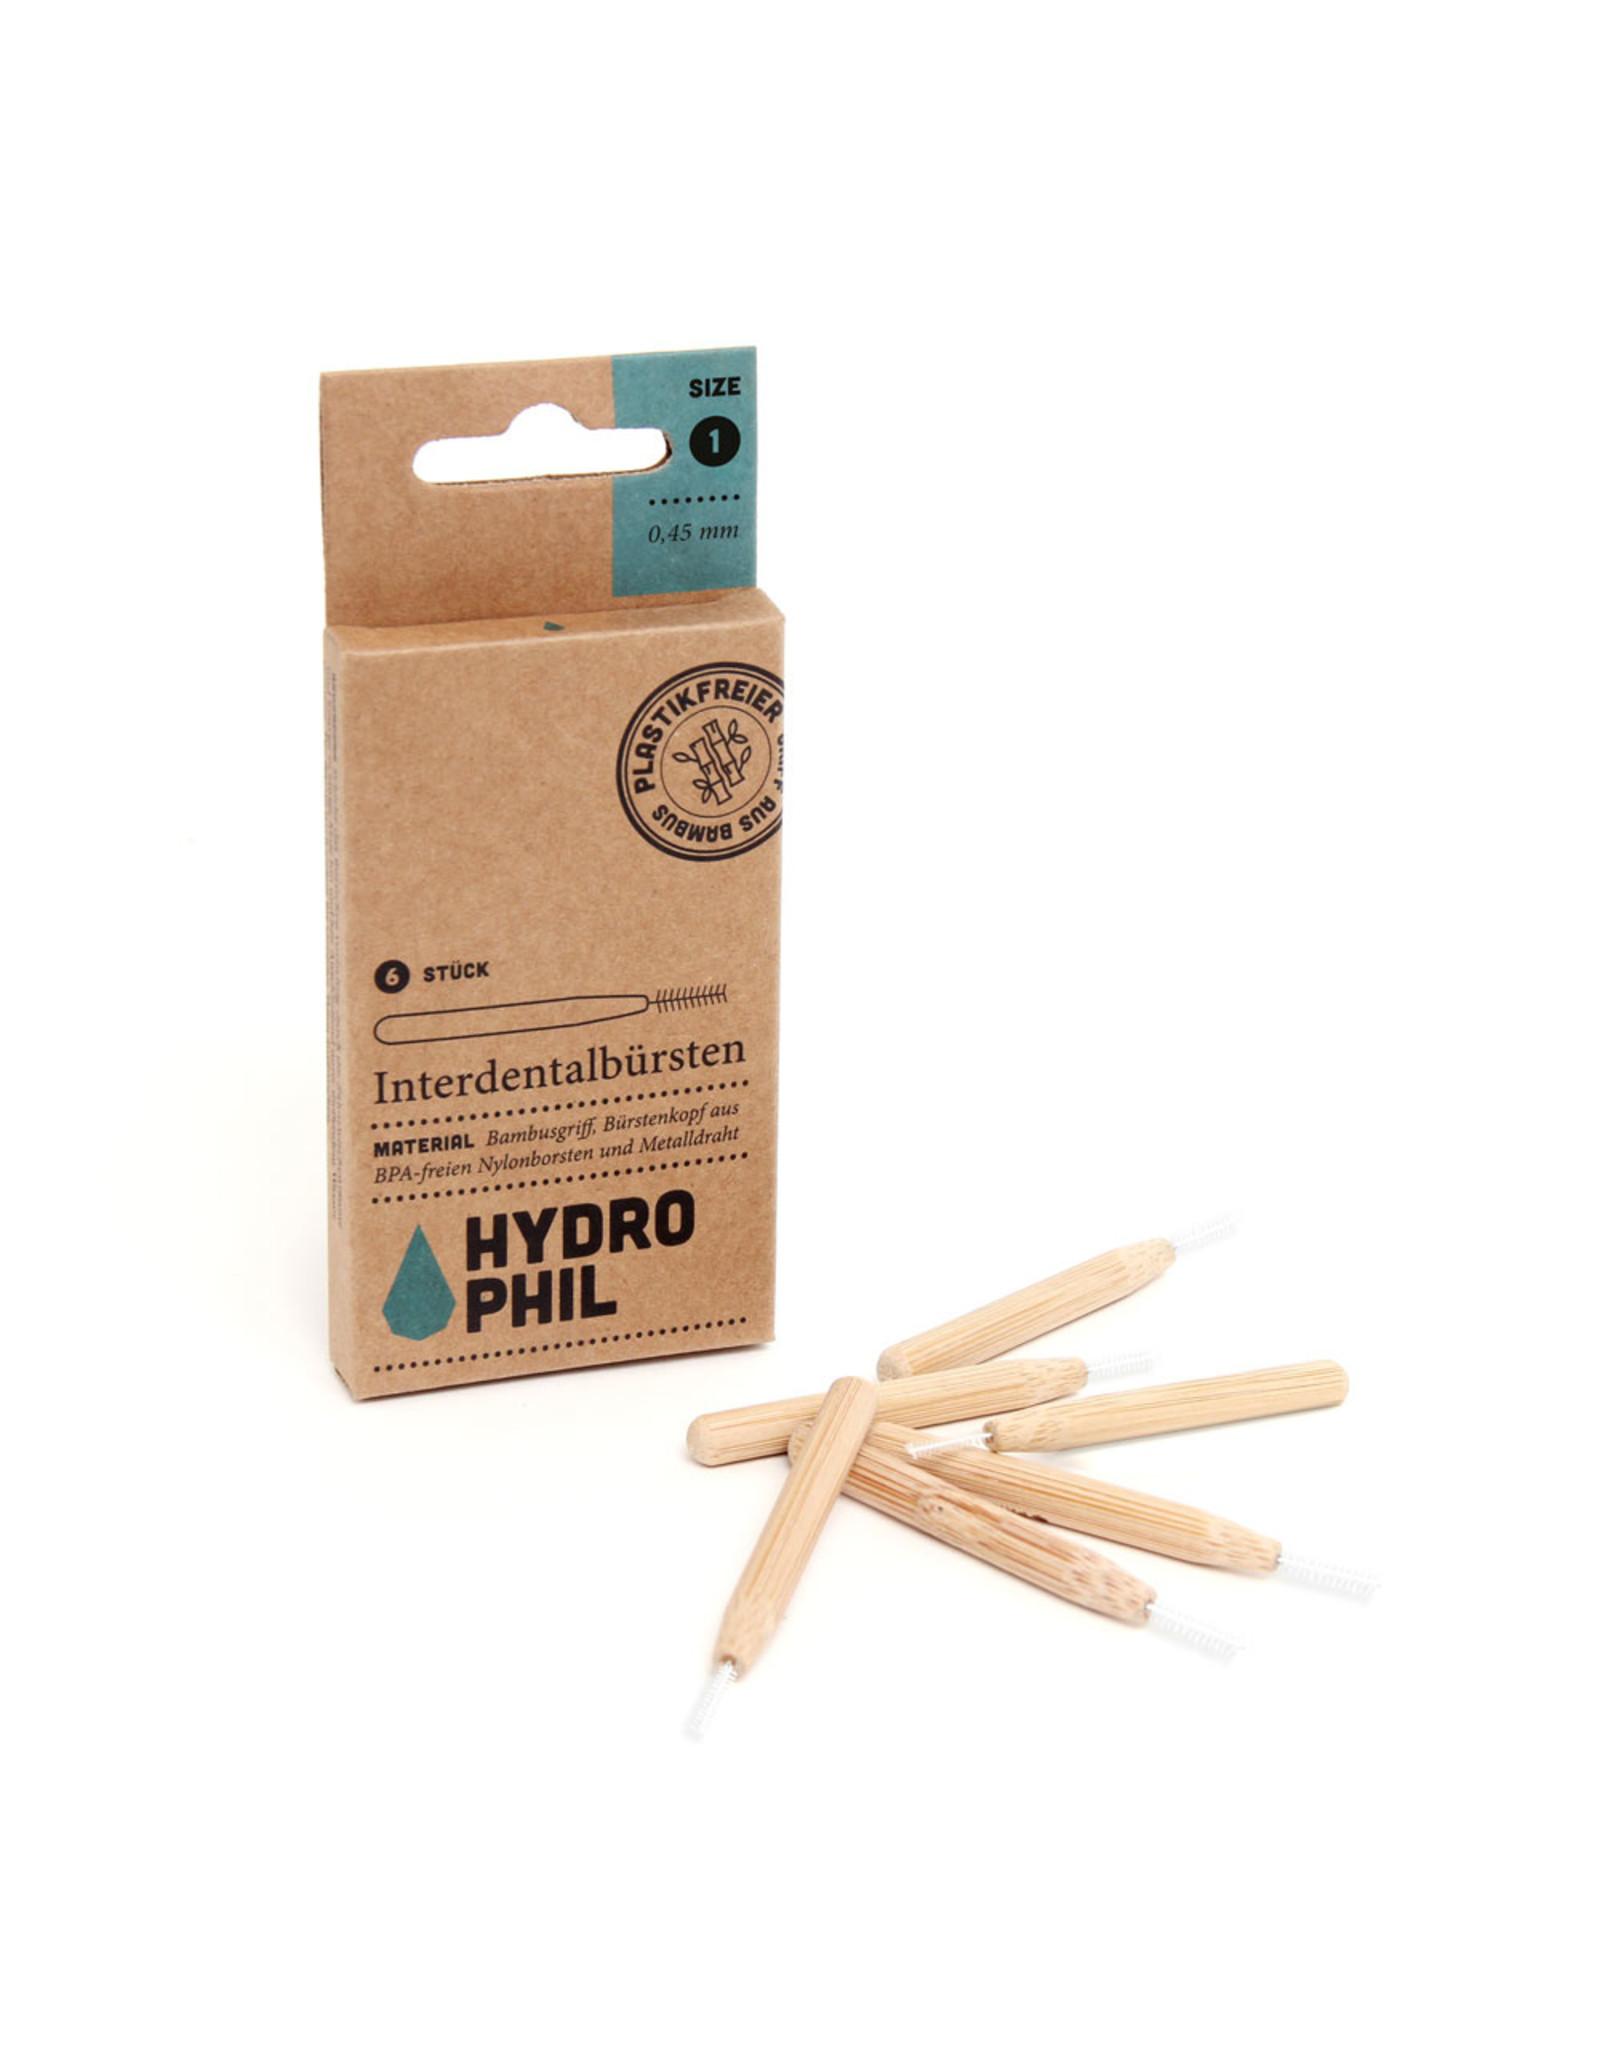 HYDROPHIL Interdental-Bürste 0,50mm 6Stk